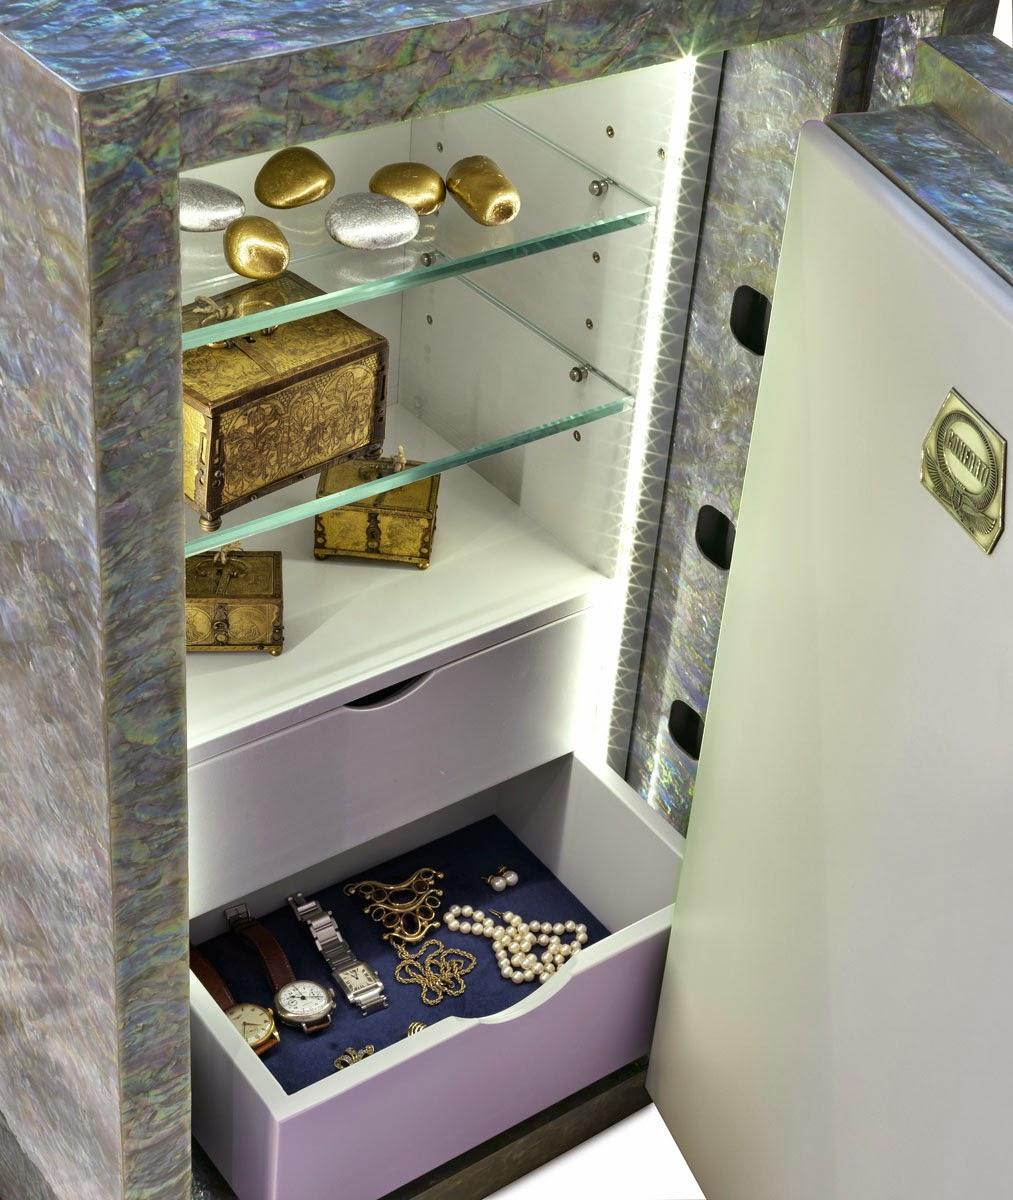 fratelli basile interiors e conforti exclusive safes